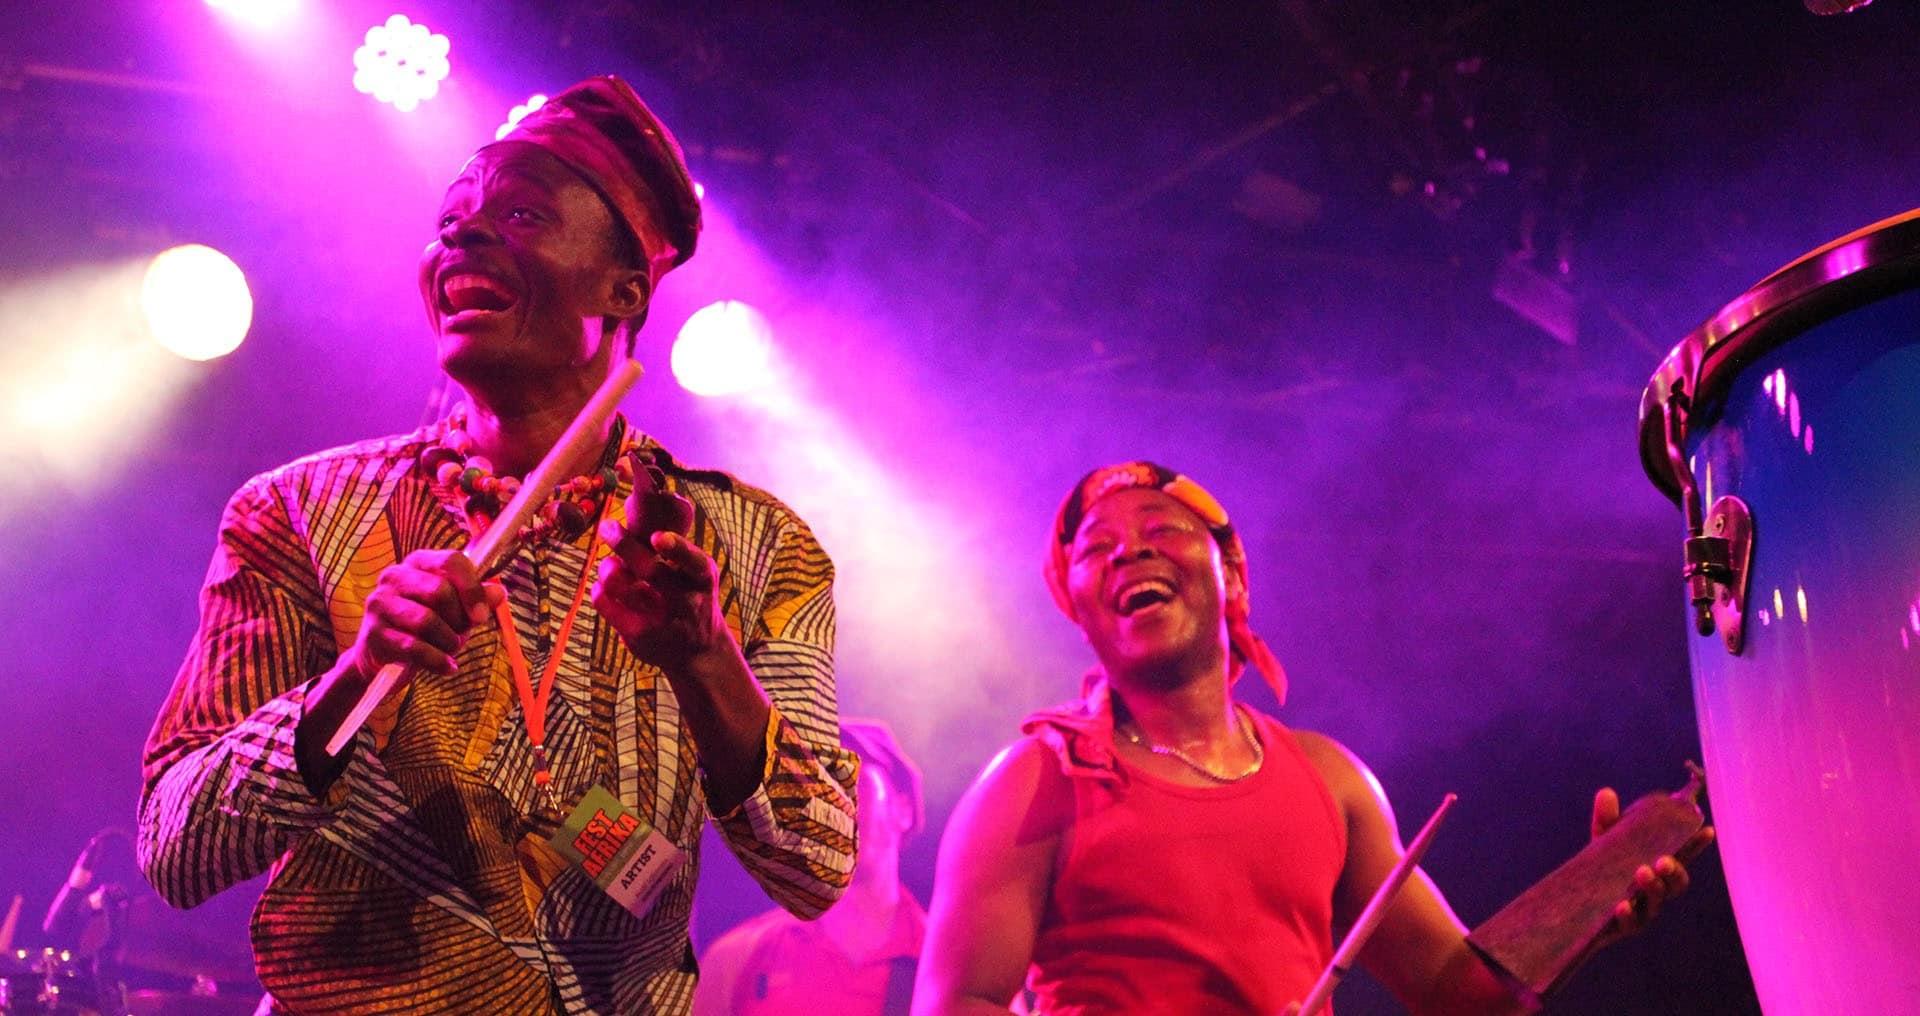 Fest Afrika 2015 3 Anna-Maija Sievi